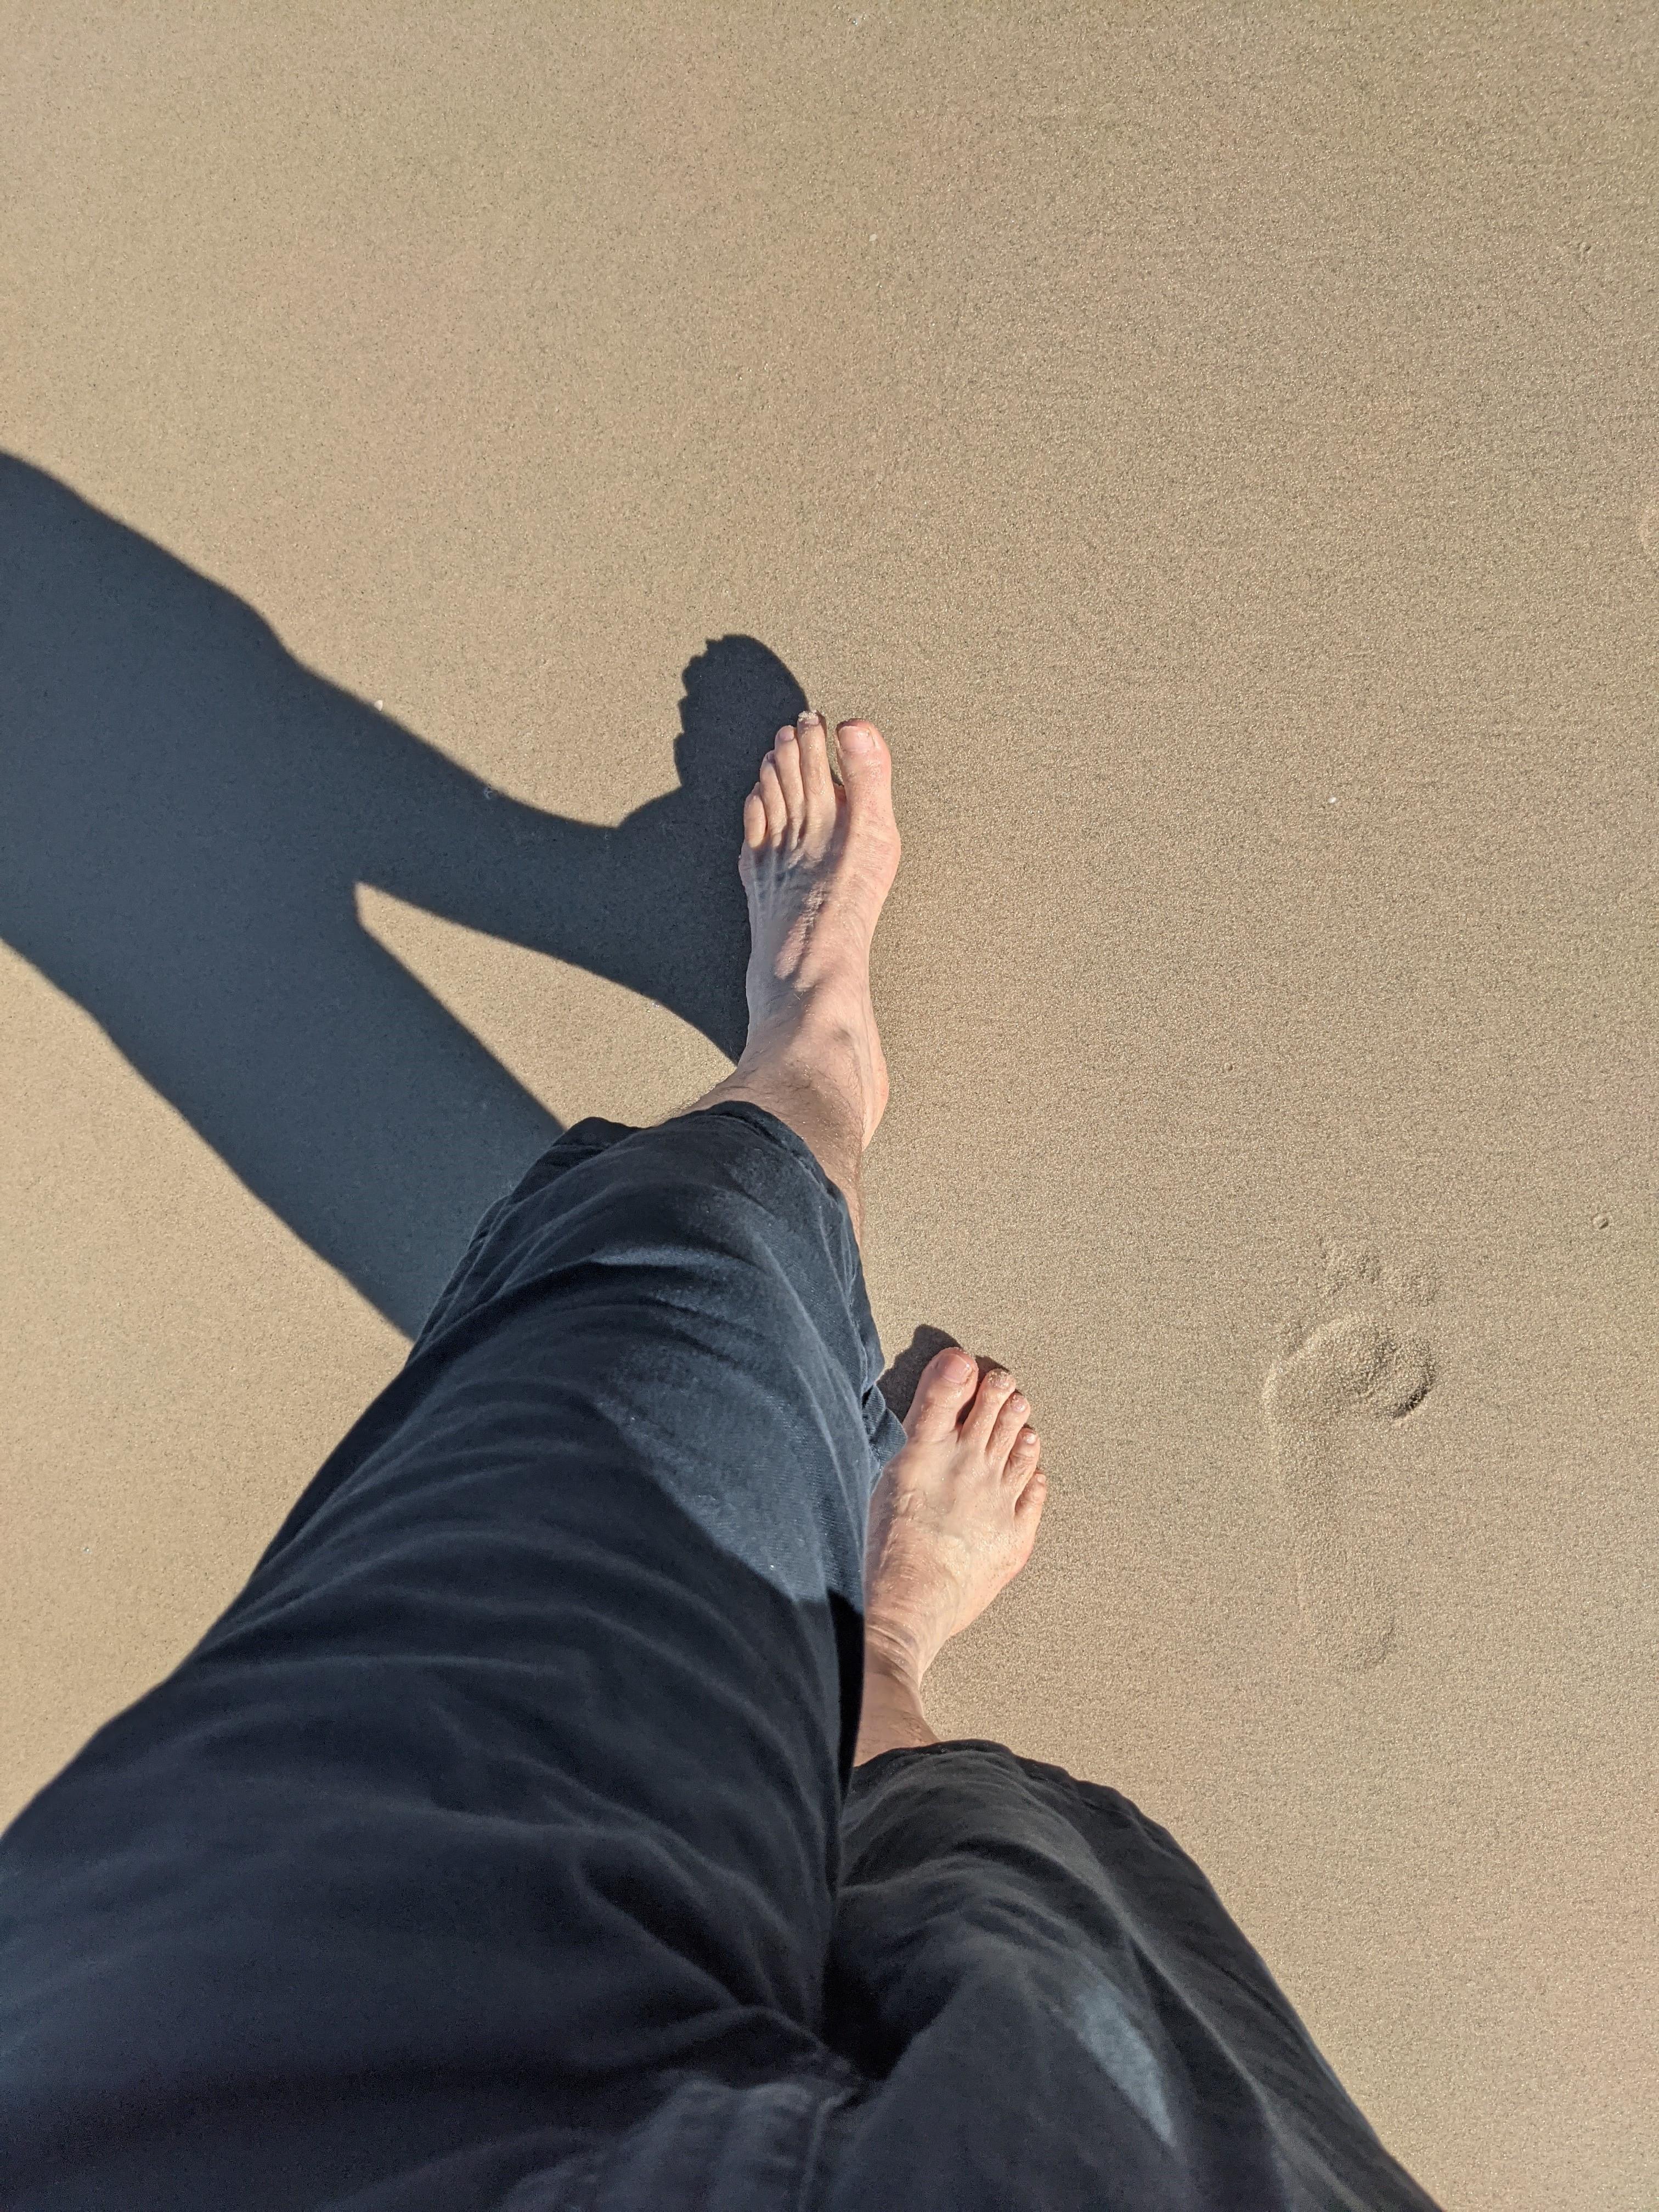 WLK + TLK | Beach | 7am